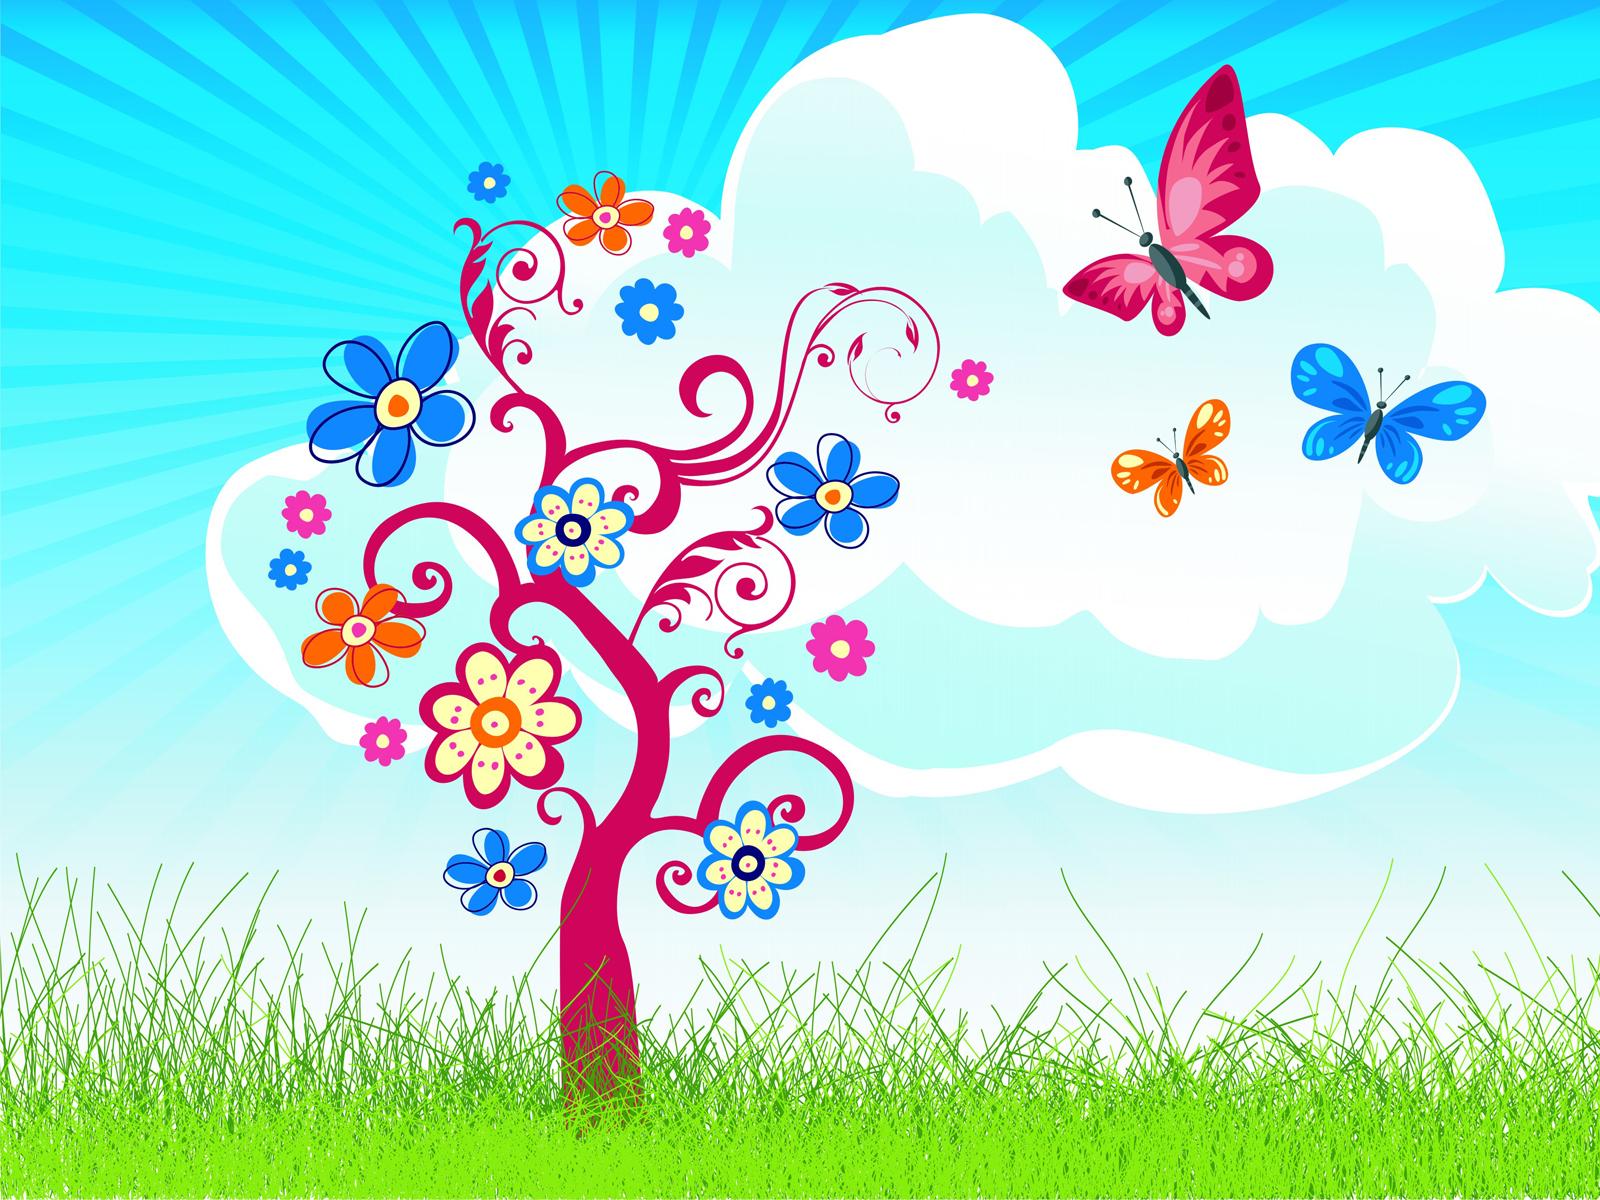 Joyful tree with butterfly PPT Backgrounds